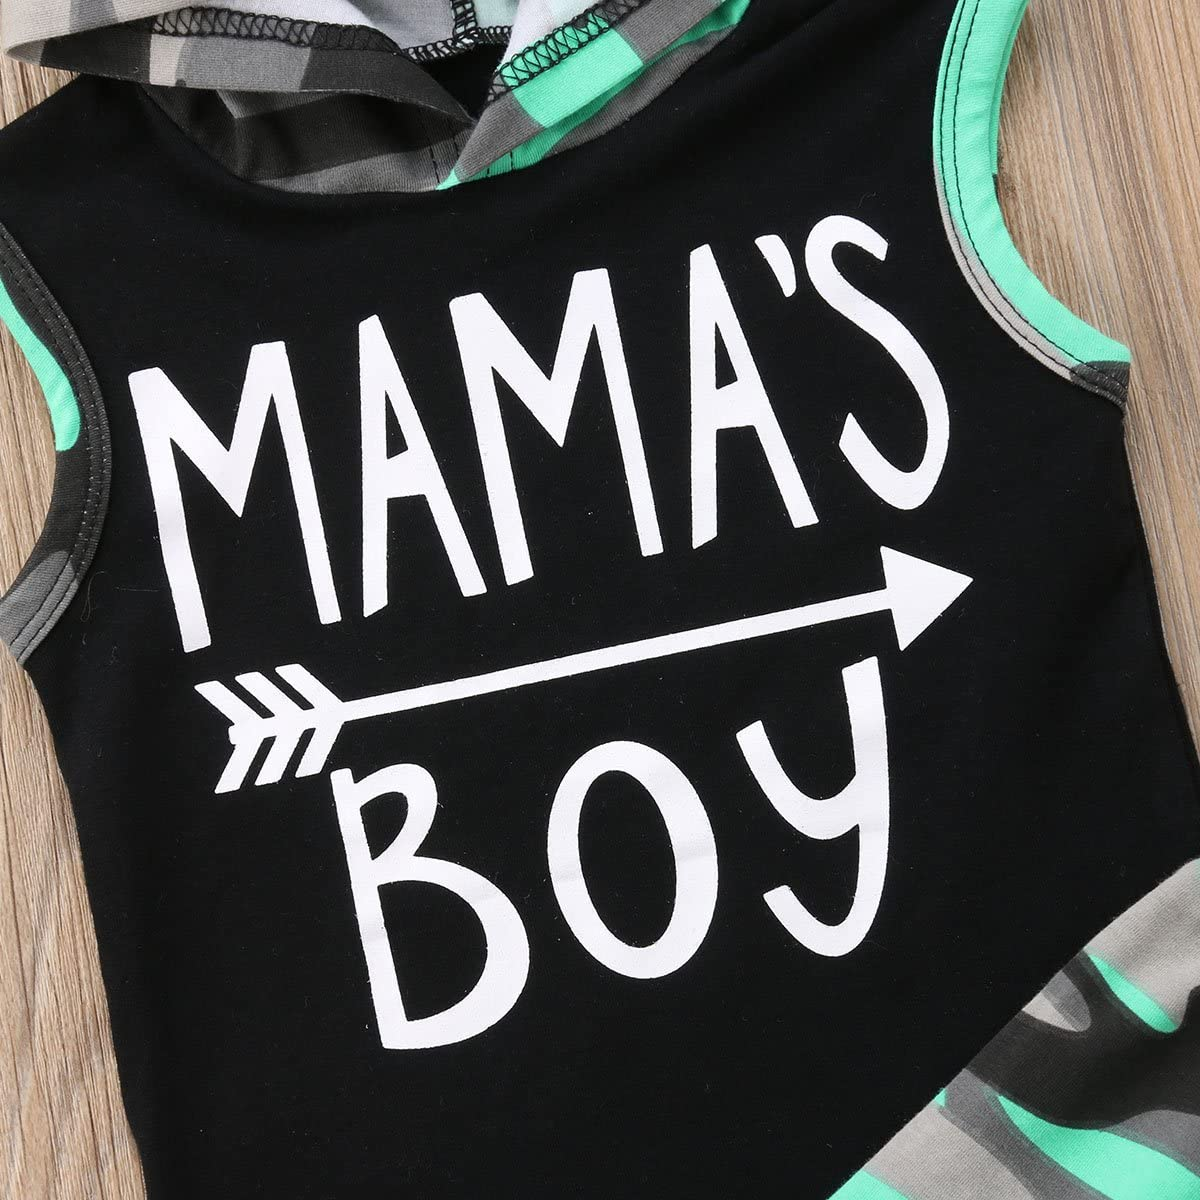 Frecoccialo Neugeborenes Baby Jungen Kleidung Set Camouflage /Ärmellos Mamas Boy Hoodie Shirt Weste Shirt Sweatshirt Shorts Hose Outfit Set Babykleidung